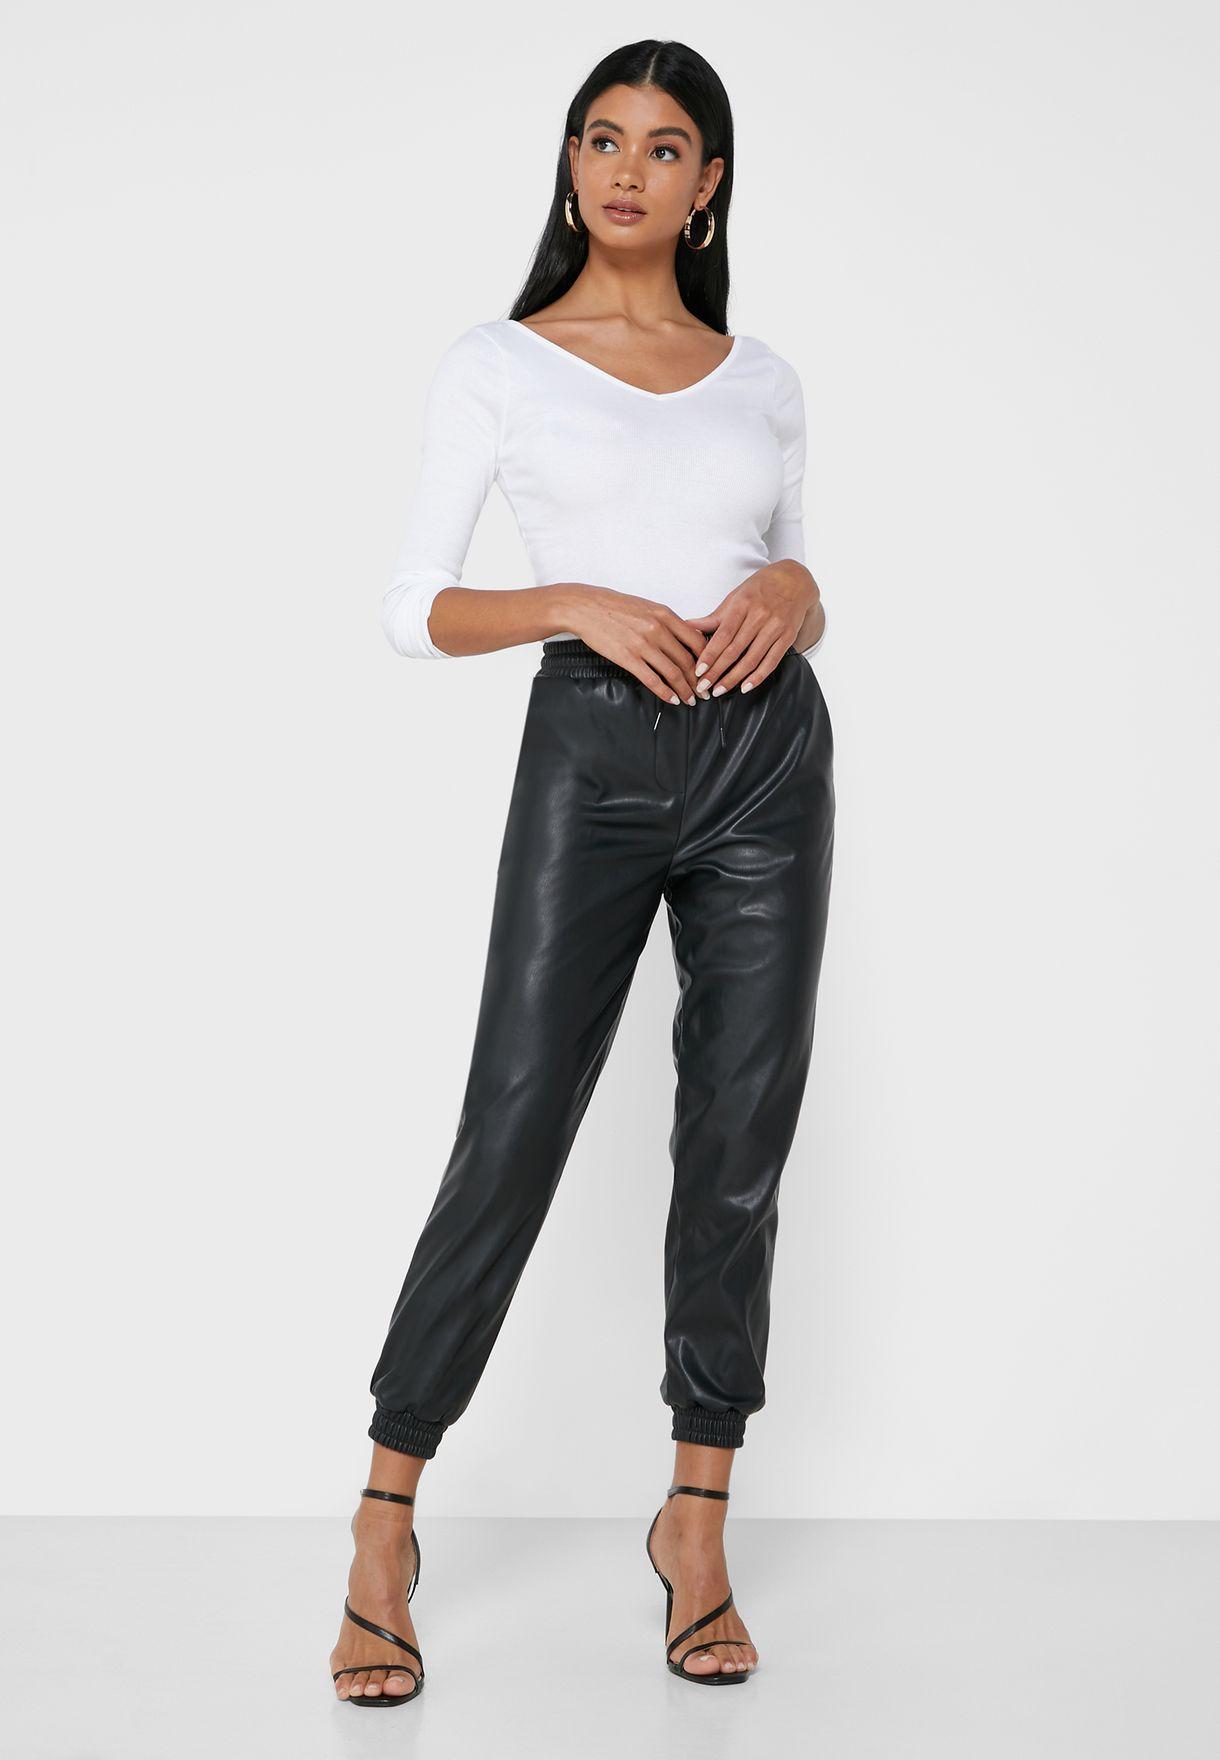 Cuff Metallic Sweatpants